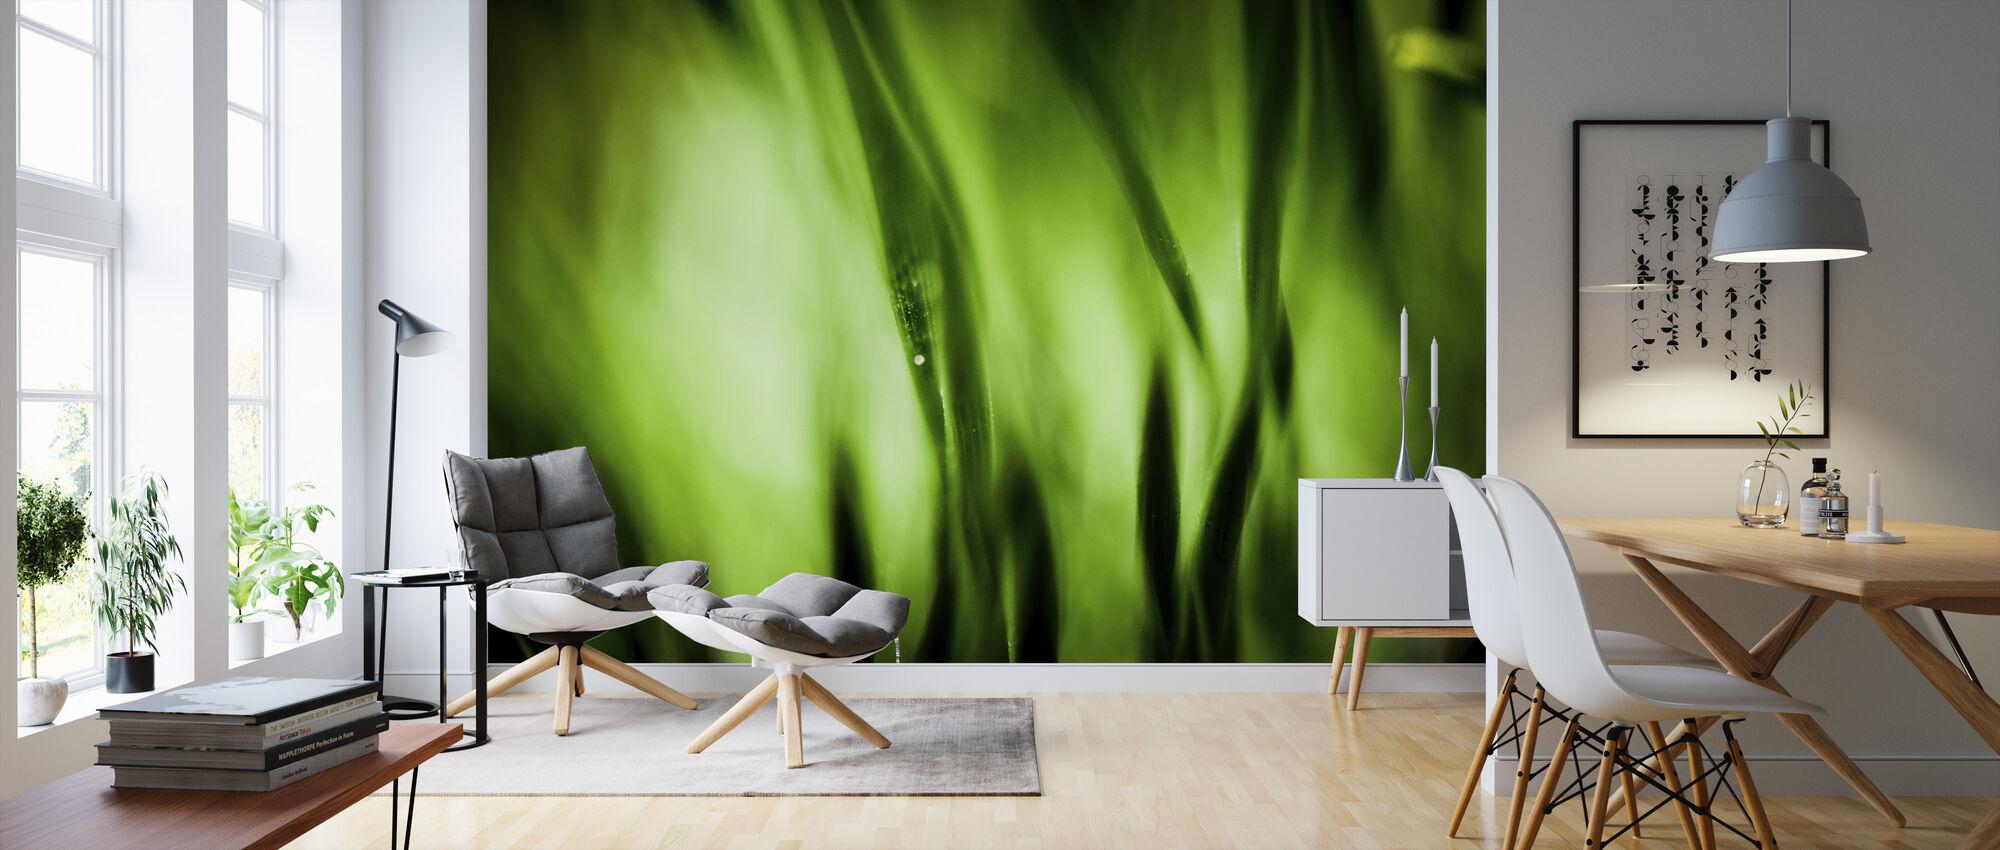 Green Garden - Wallpaper - Living Room